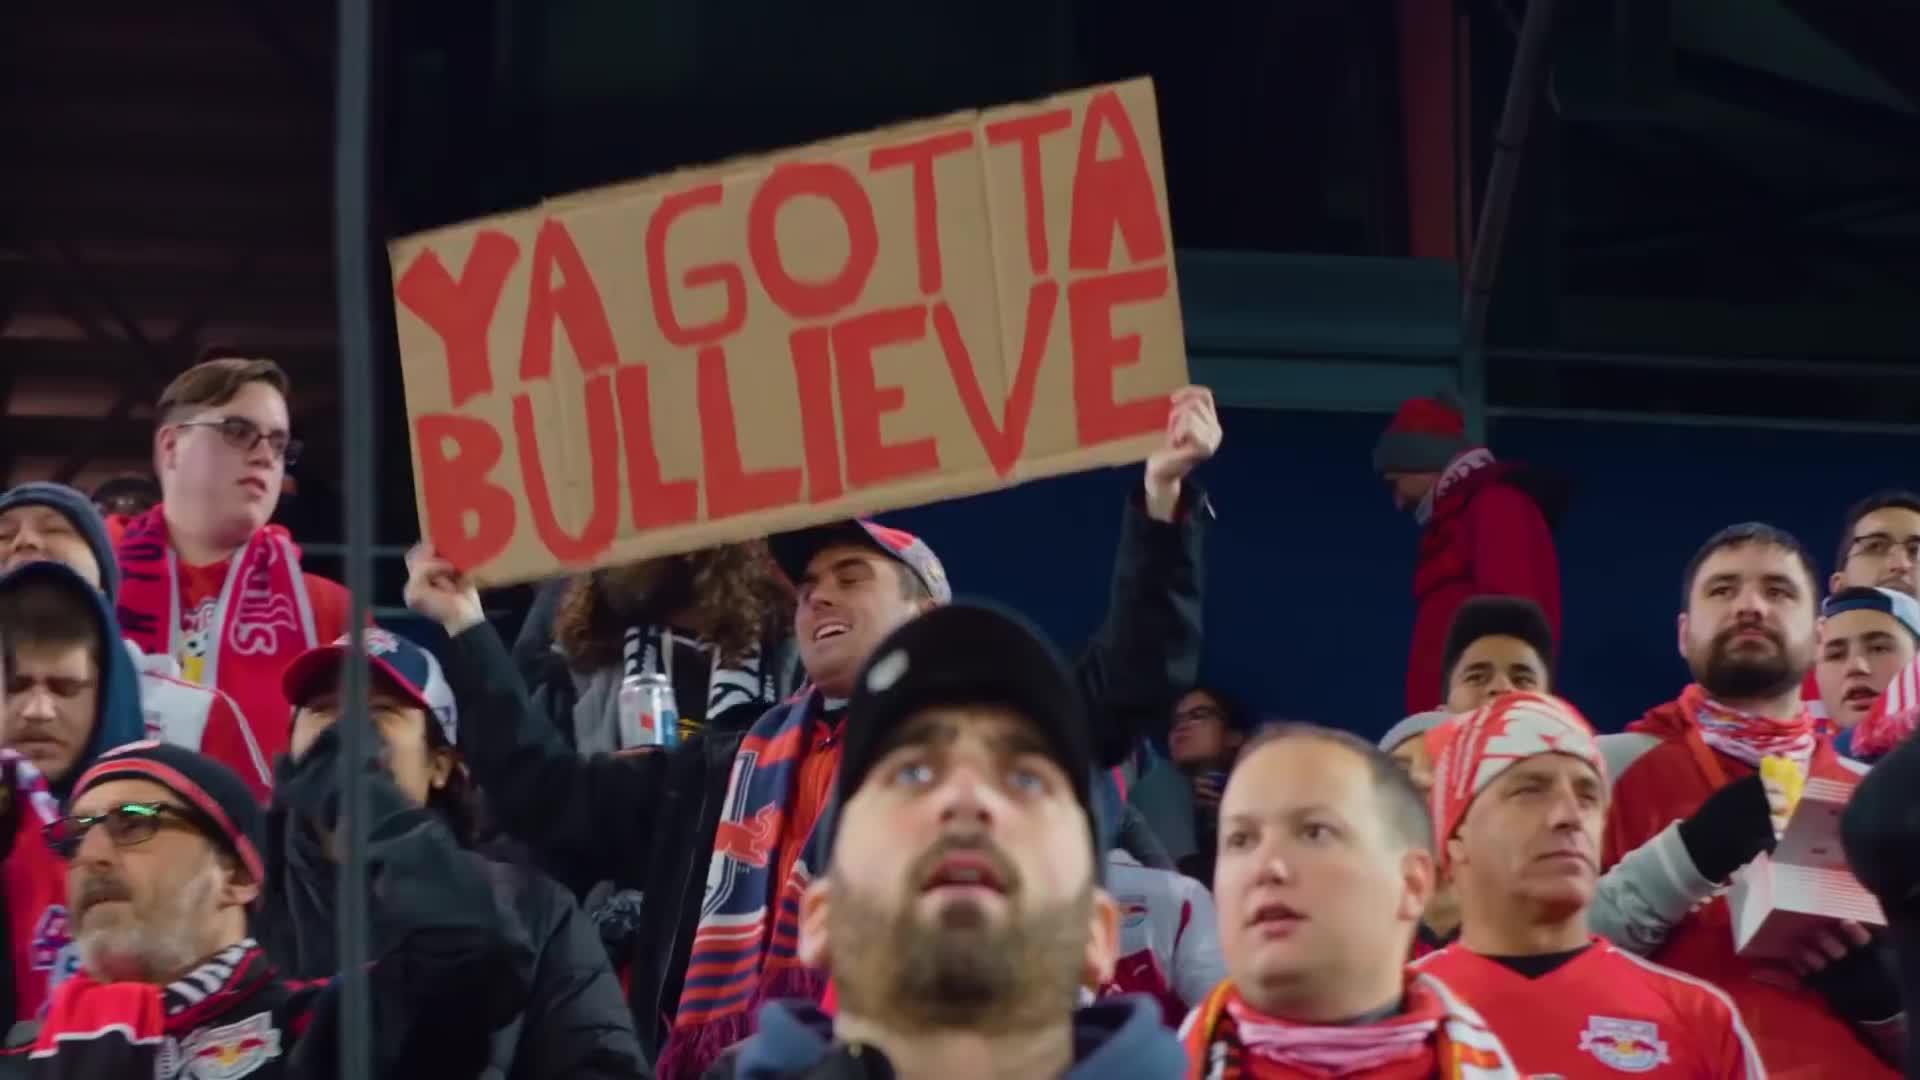 Futbol, New York, Soccer, Sports, major league soccer, mls, new york red bulls, rbny, red bull arena, Ya Gotta BULLieve! GIFs